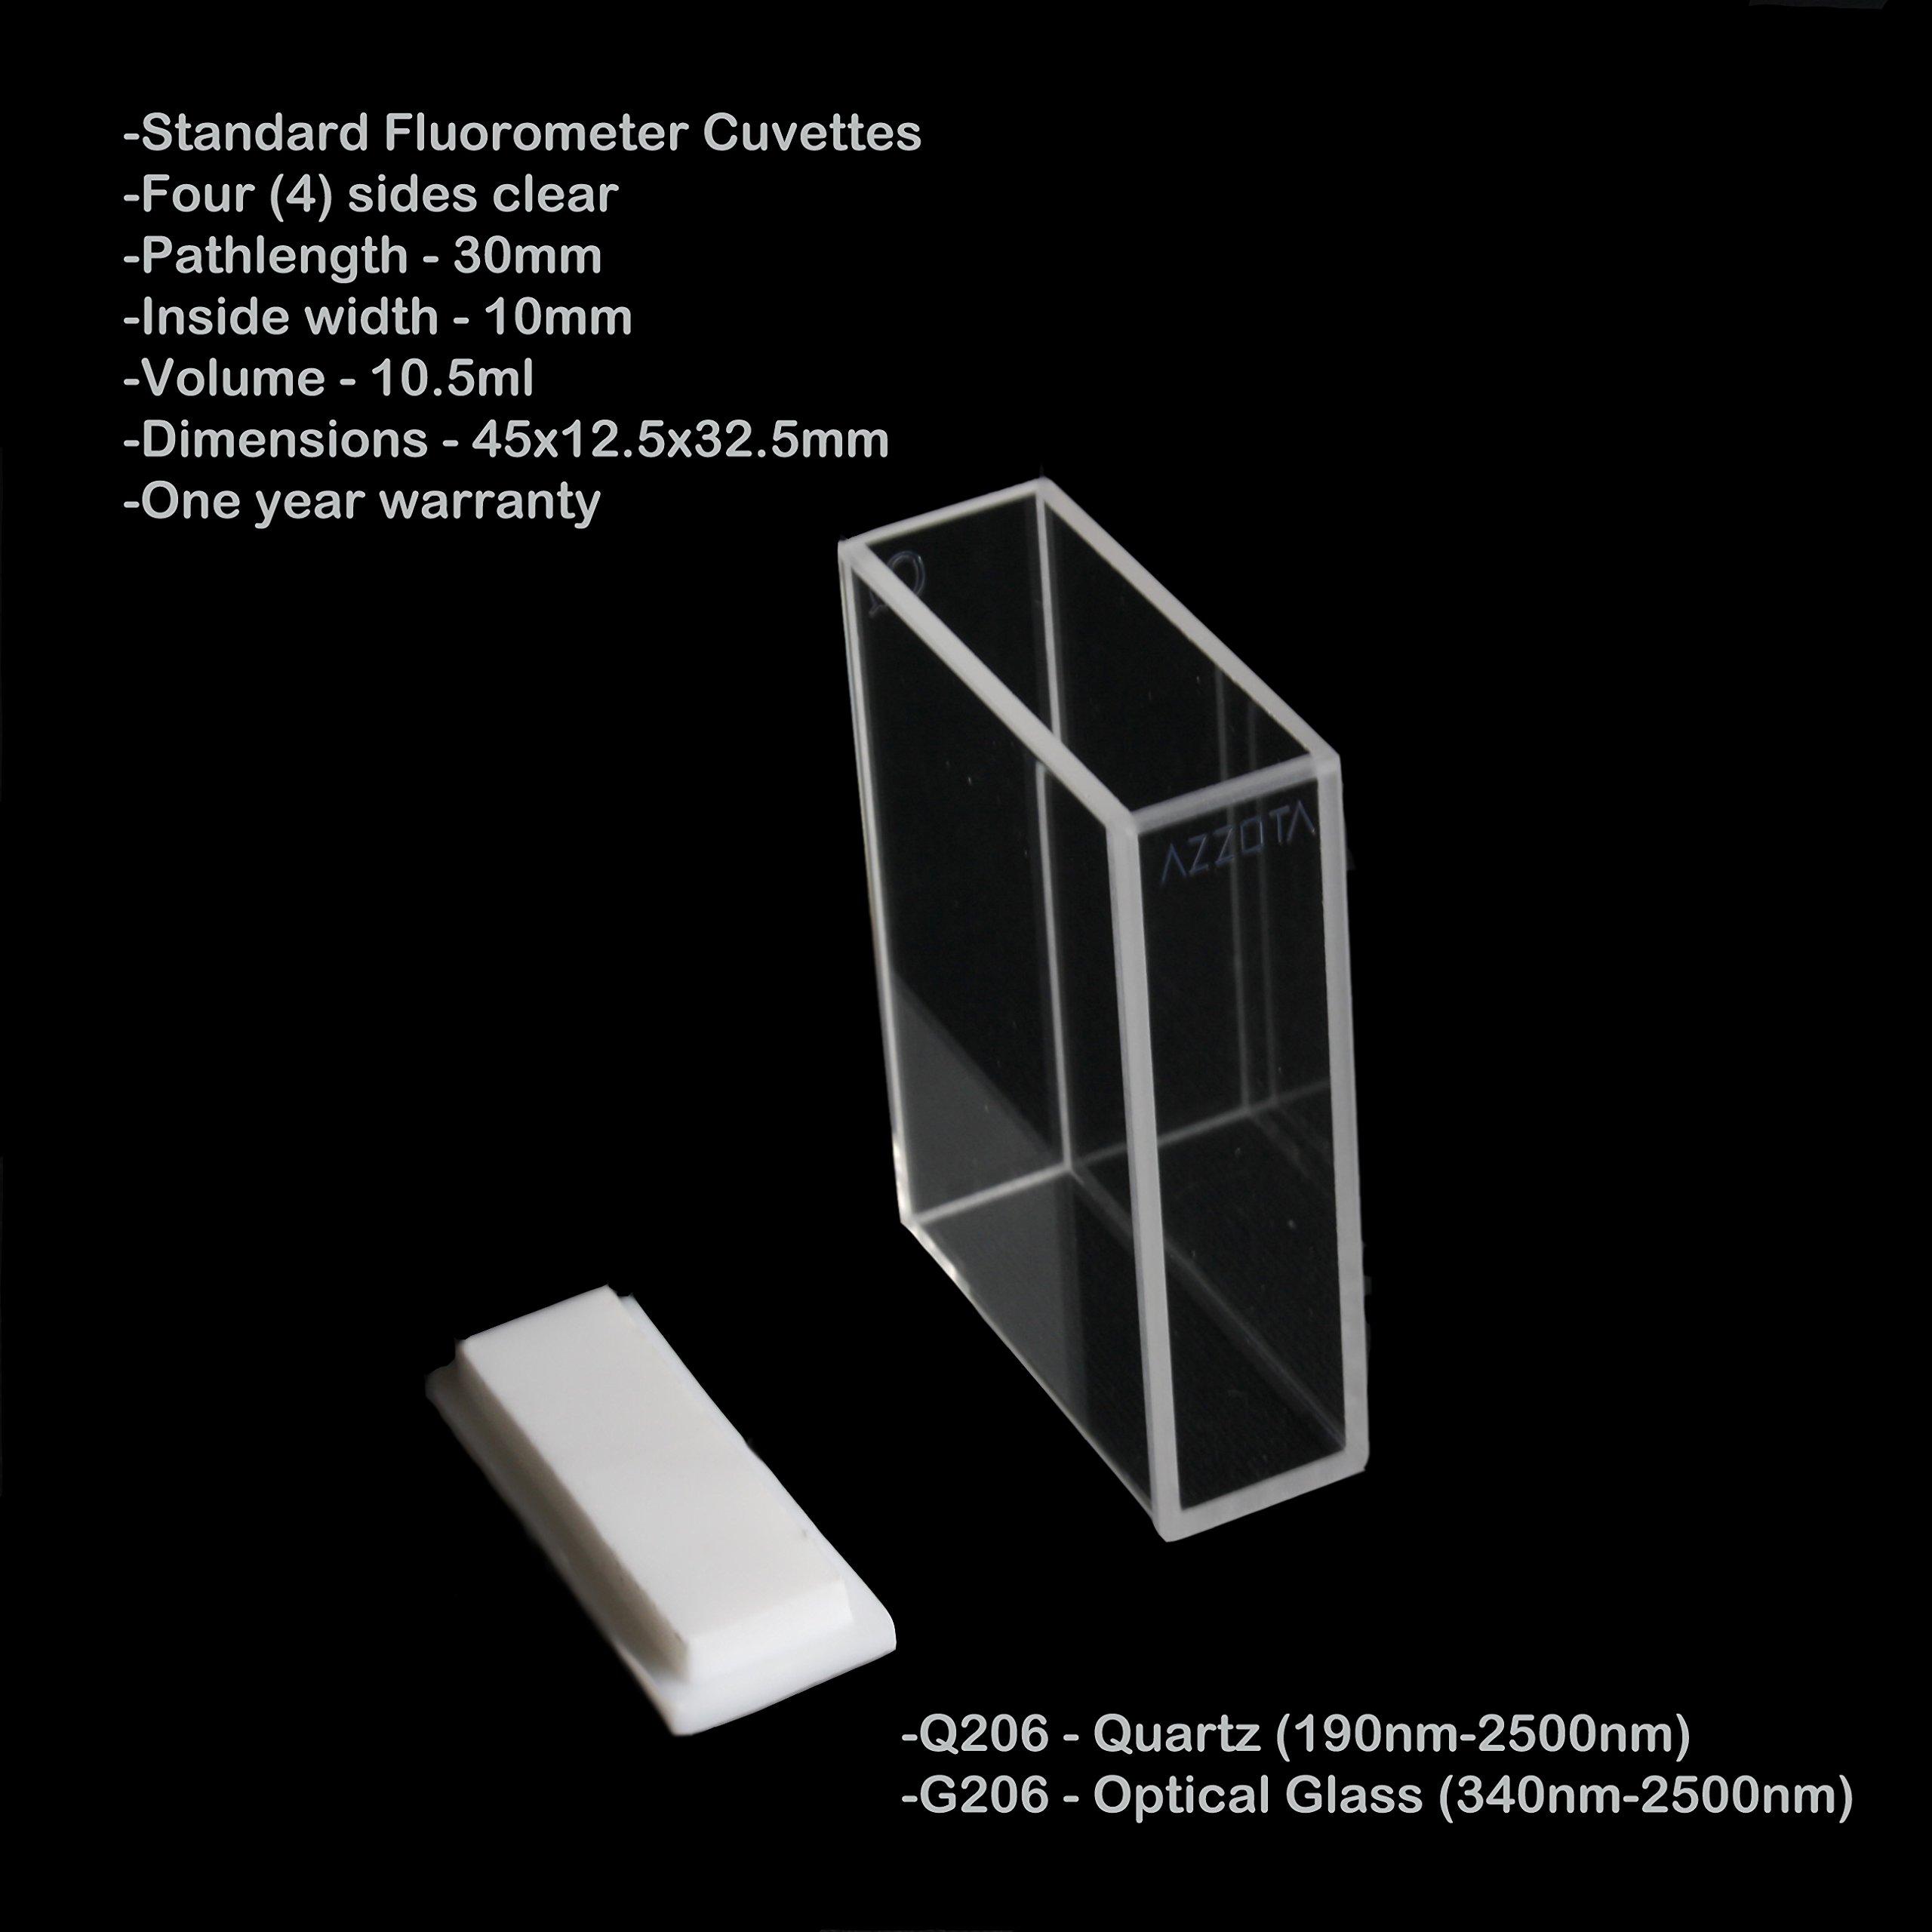 Azzota Q206 Standard Fluorimeter Cell, Lid, Quartz, 30mm Path Length, 10.5mL Volume by Azzota